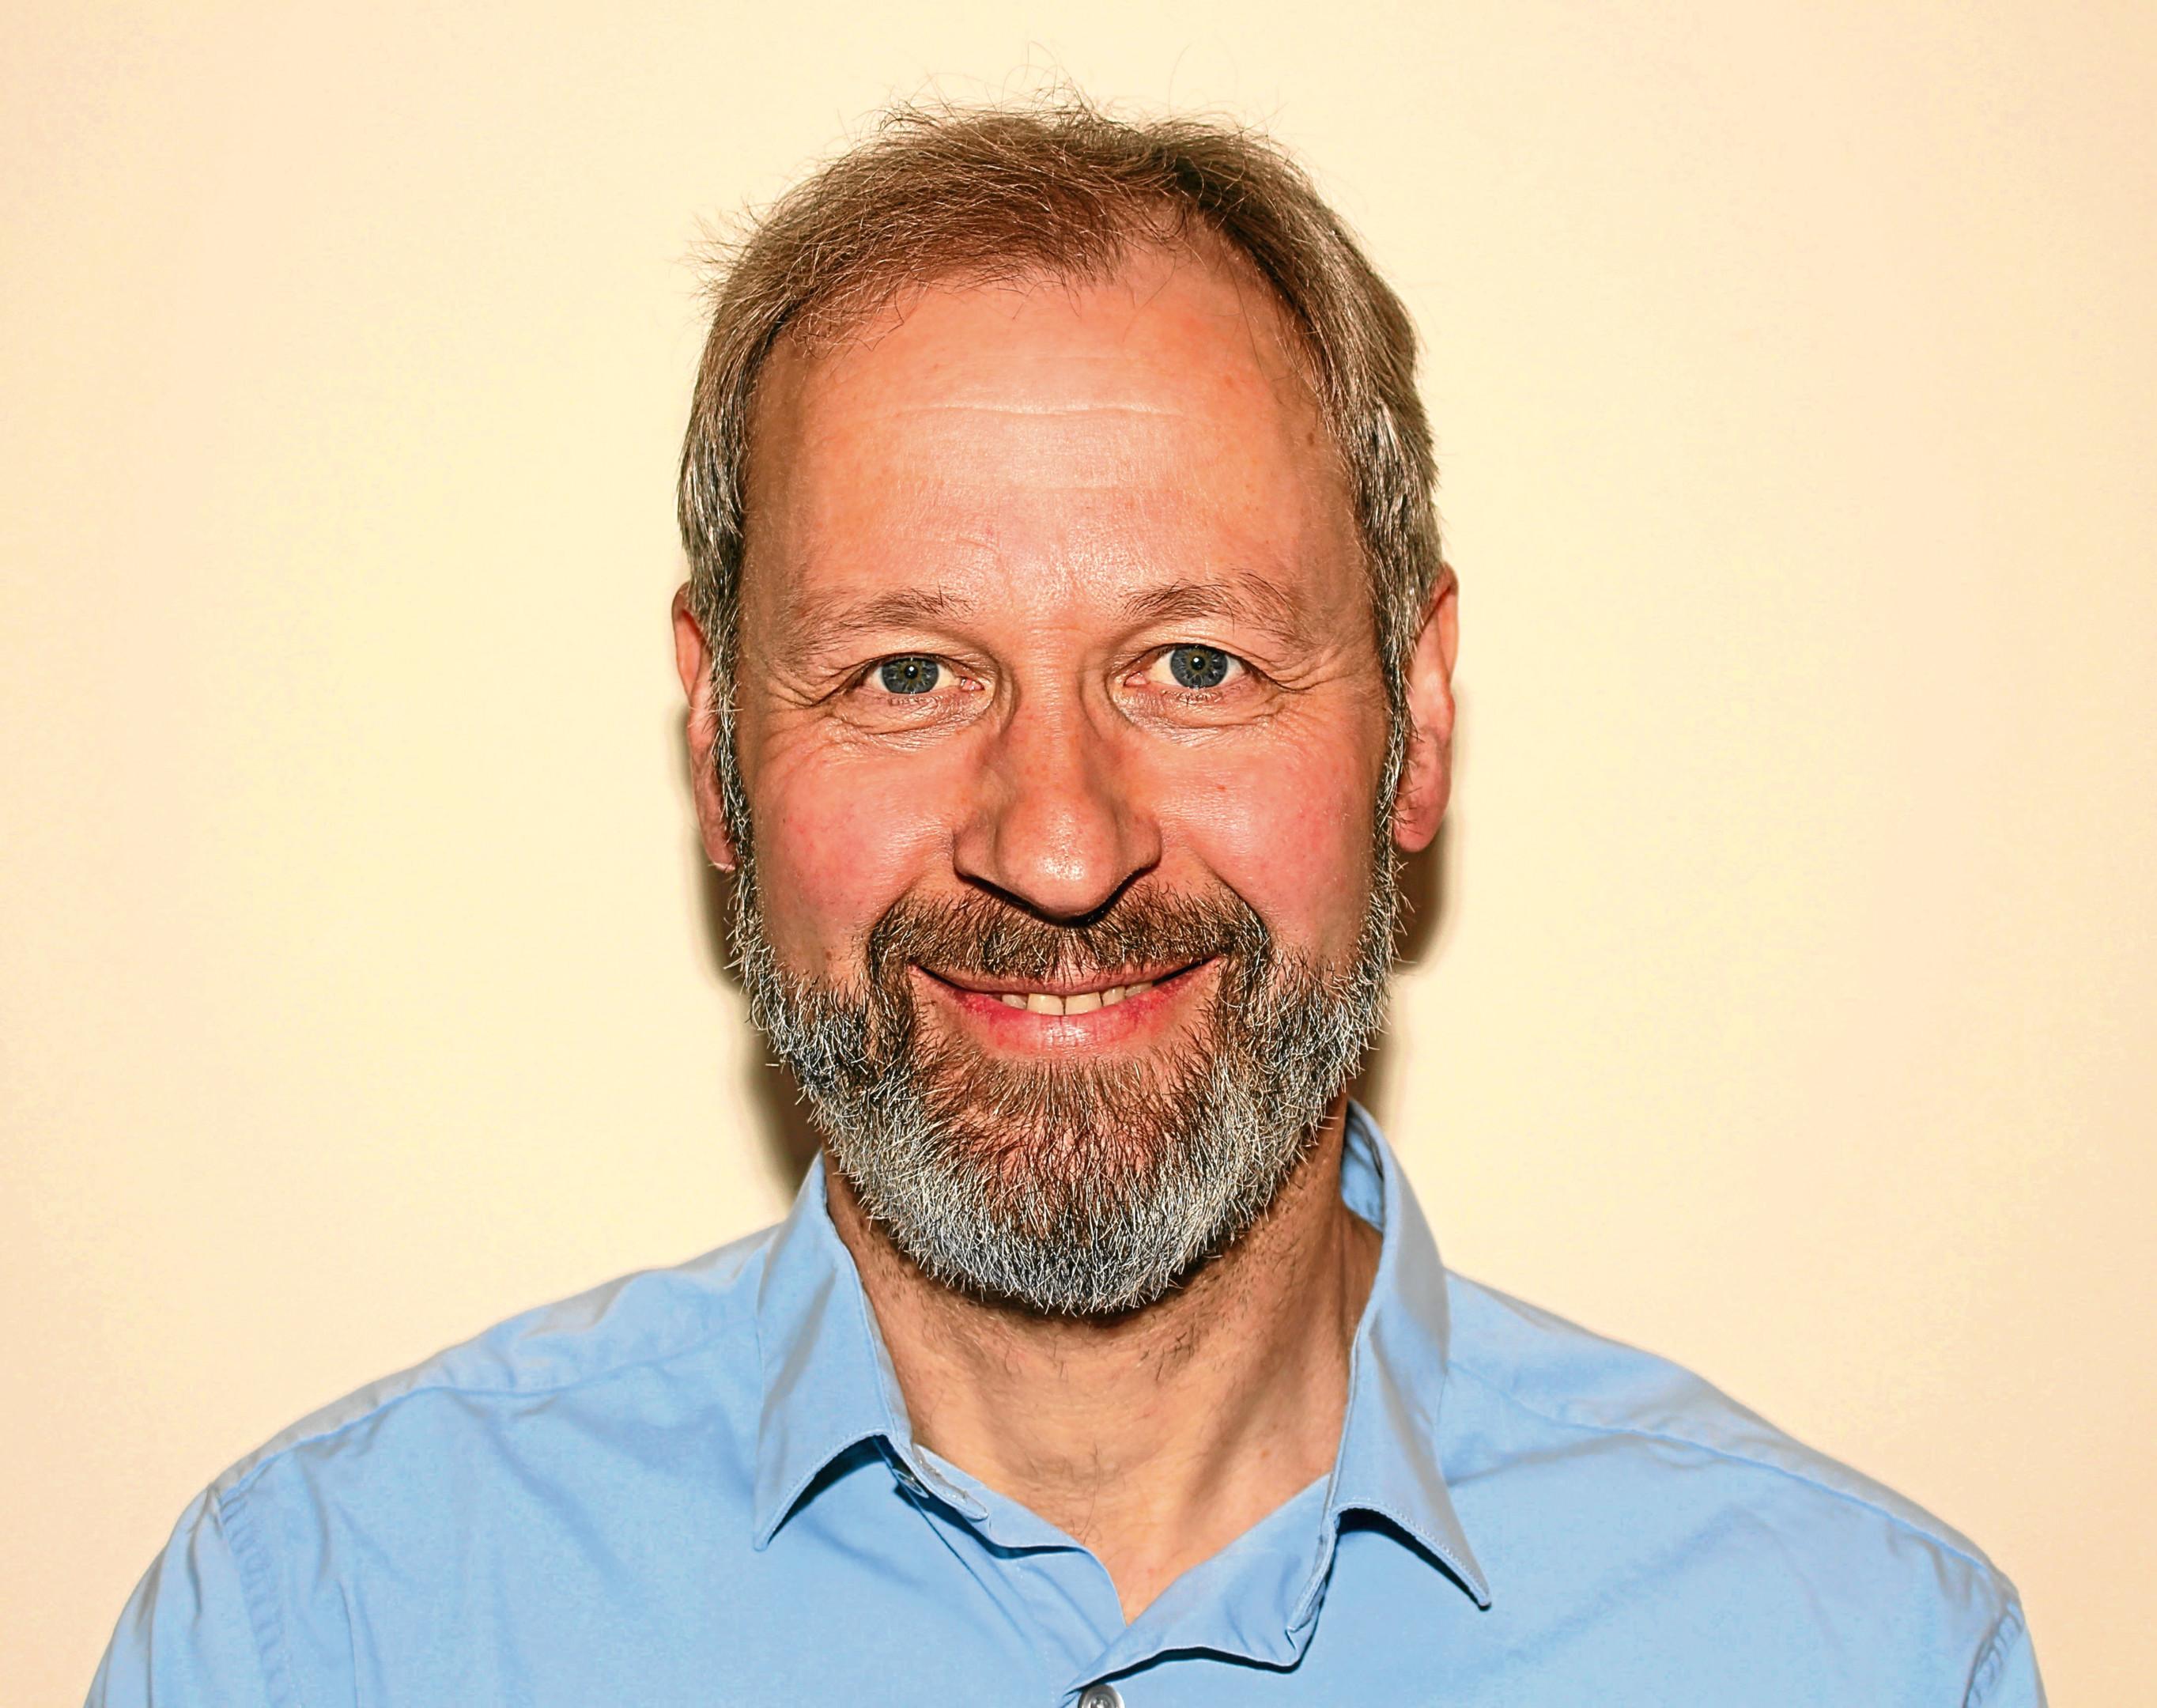 Professor Iain Baikie, who runs KP Technology Ltd in Wick.